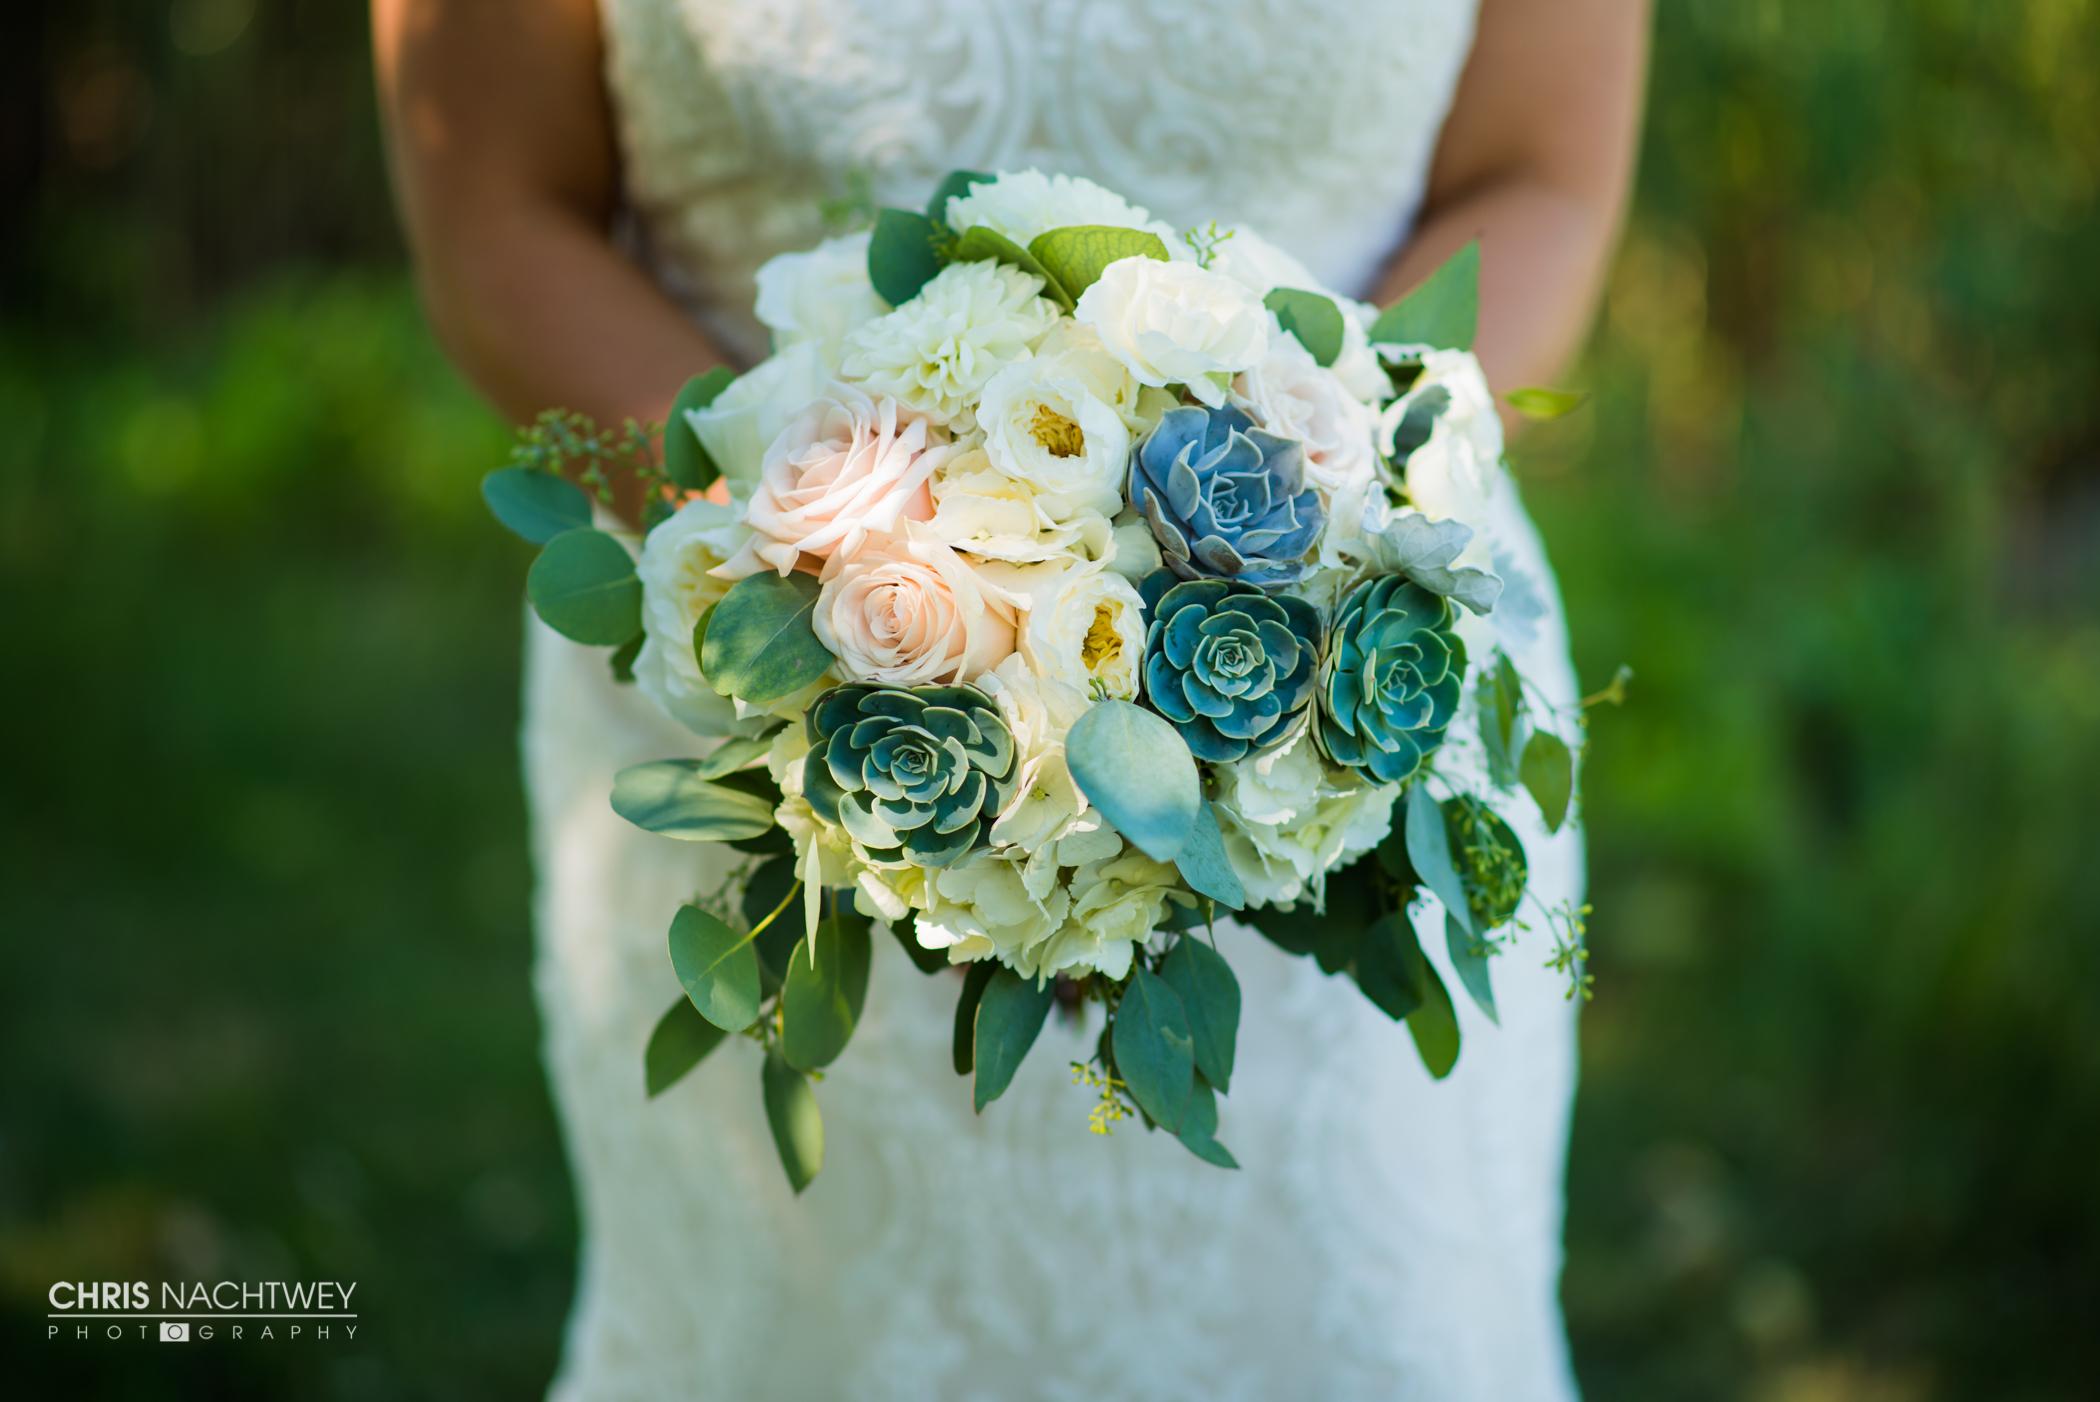 saltwater-farm-vineyard-wedding-photos-lindsay-gabe-chris-nachtwey-photography-2017-25.jpg